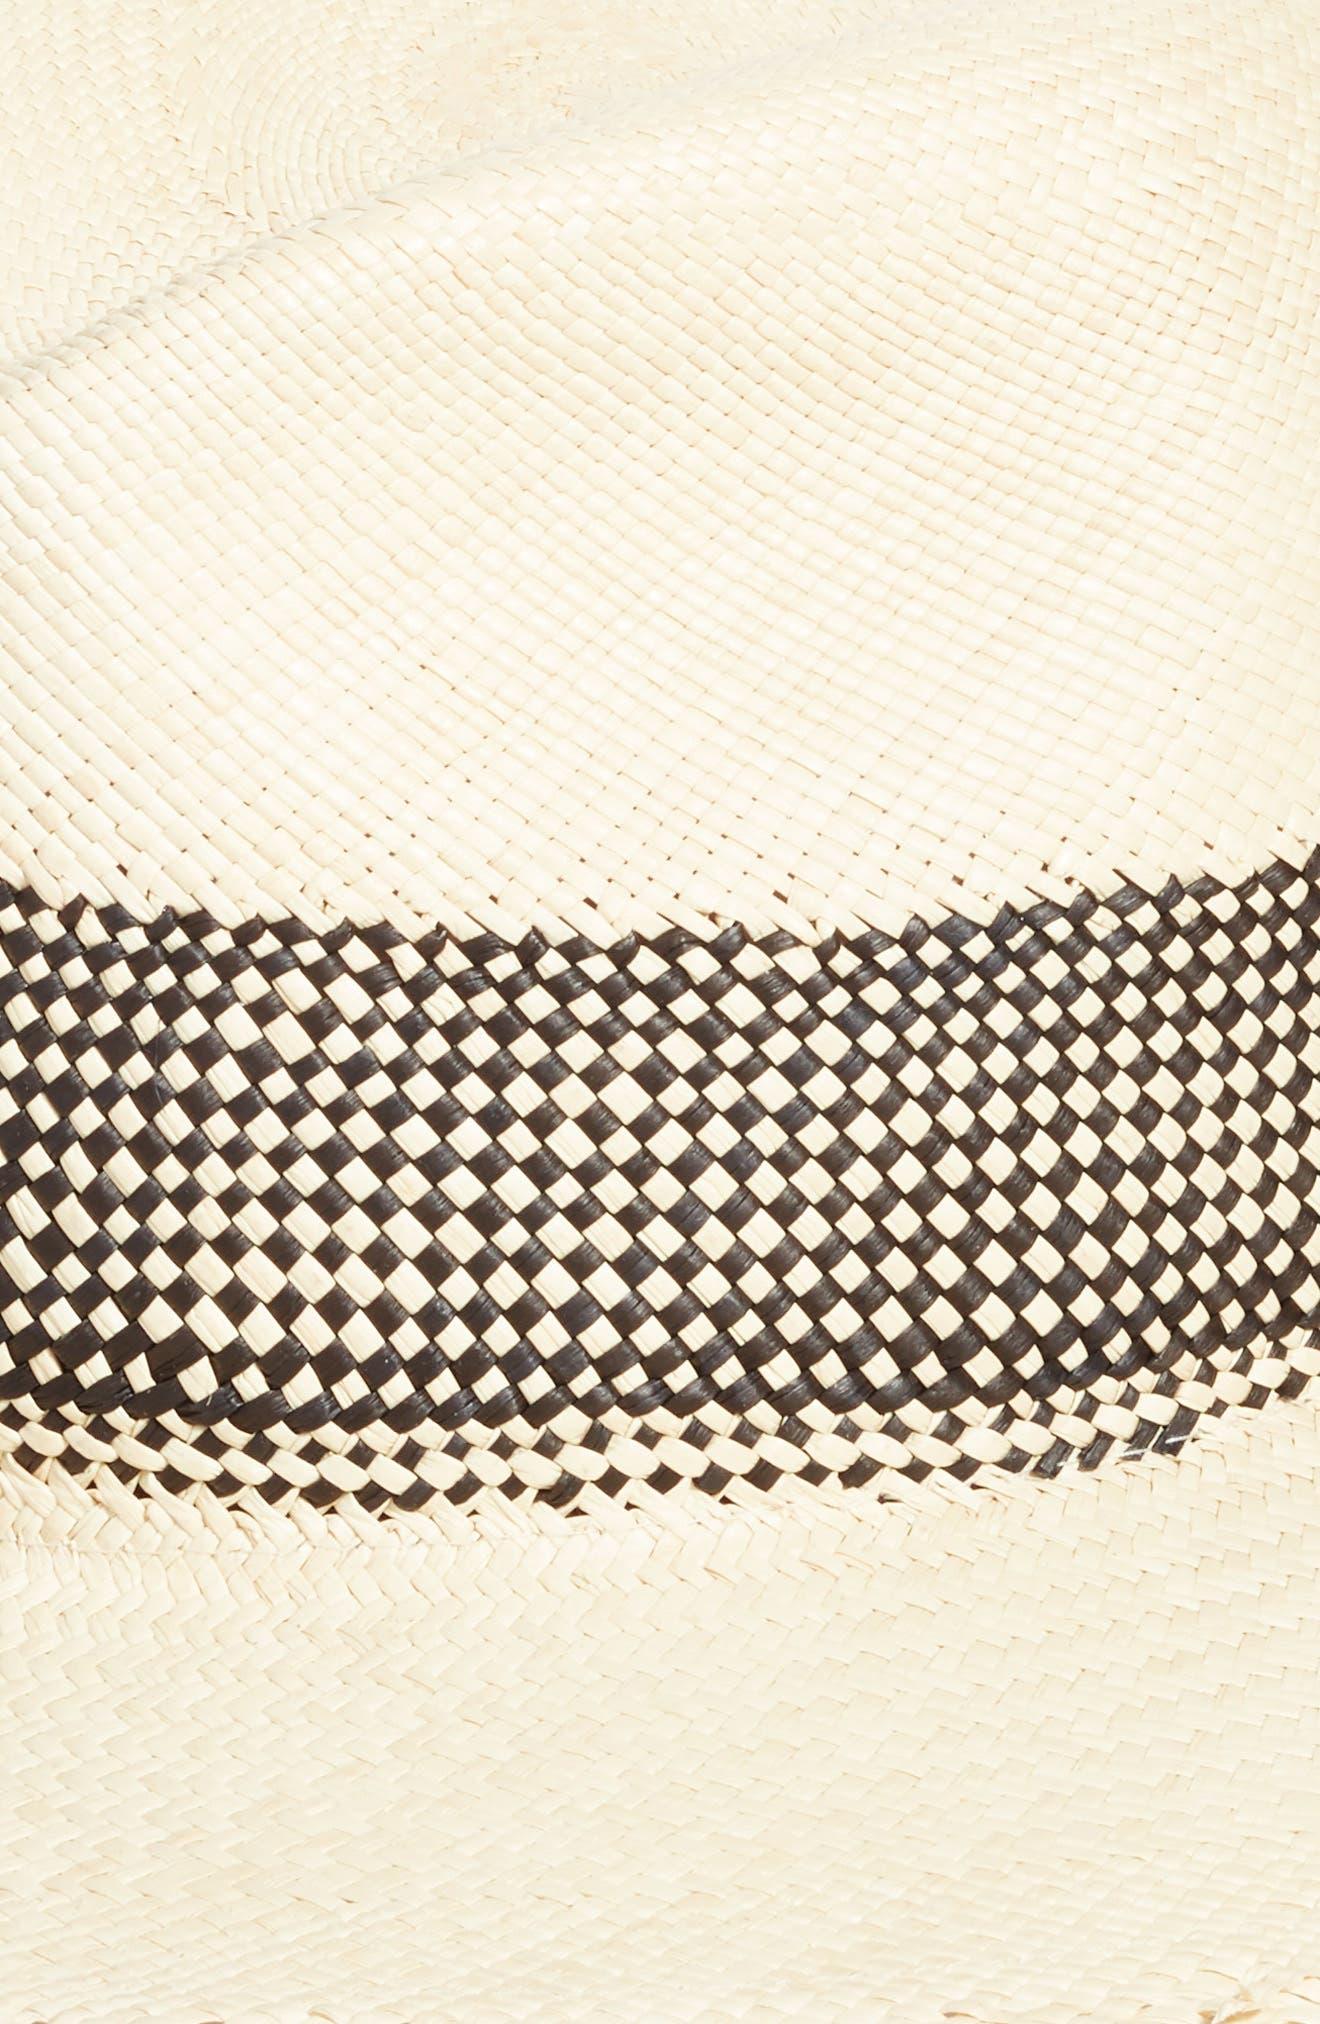 Frayed Edge Panama Straw Hat,                             Alternate thumbnail 2, color,                             BLACK MULTI